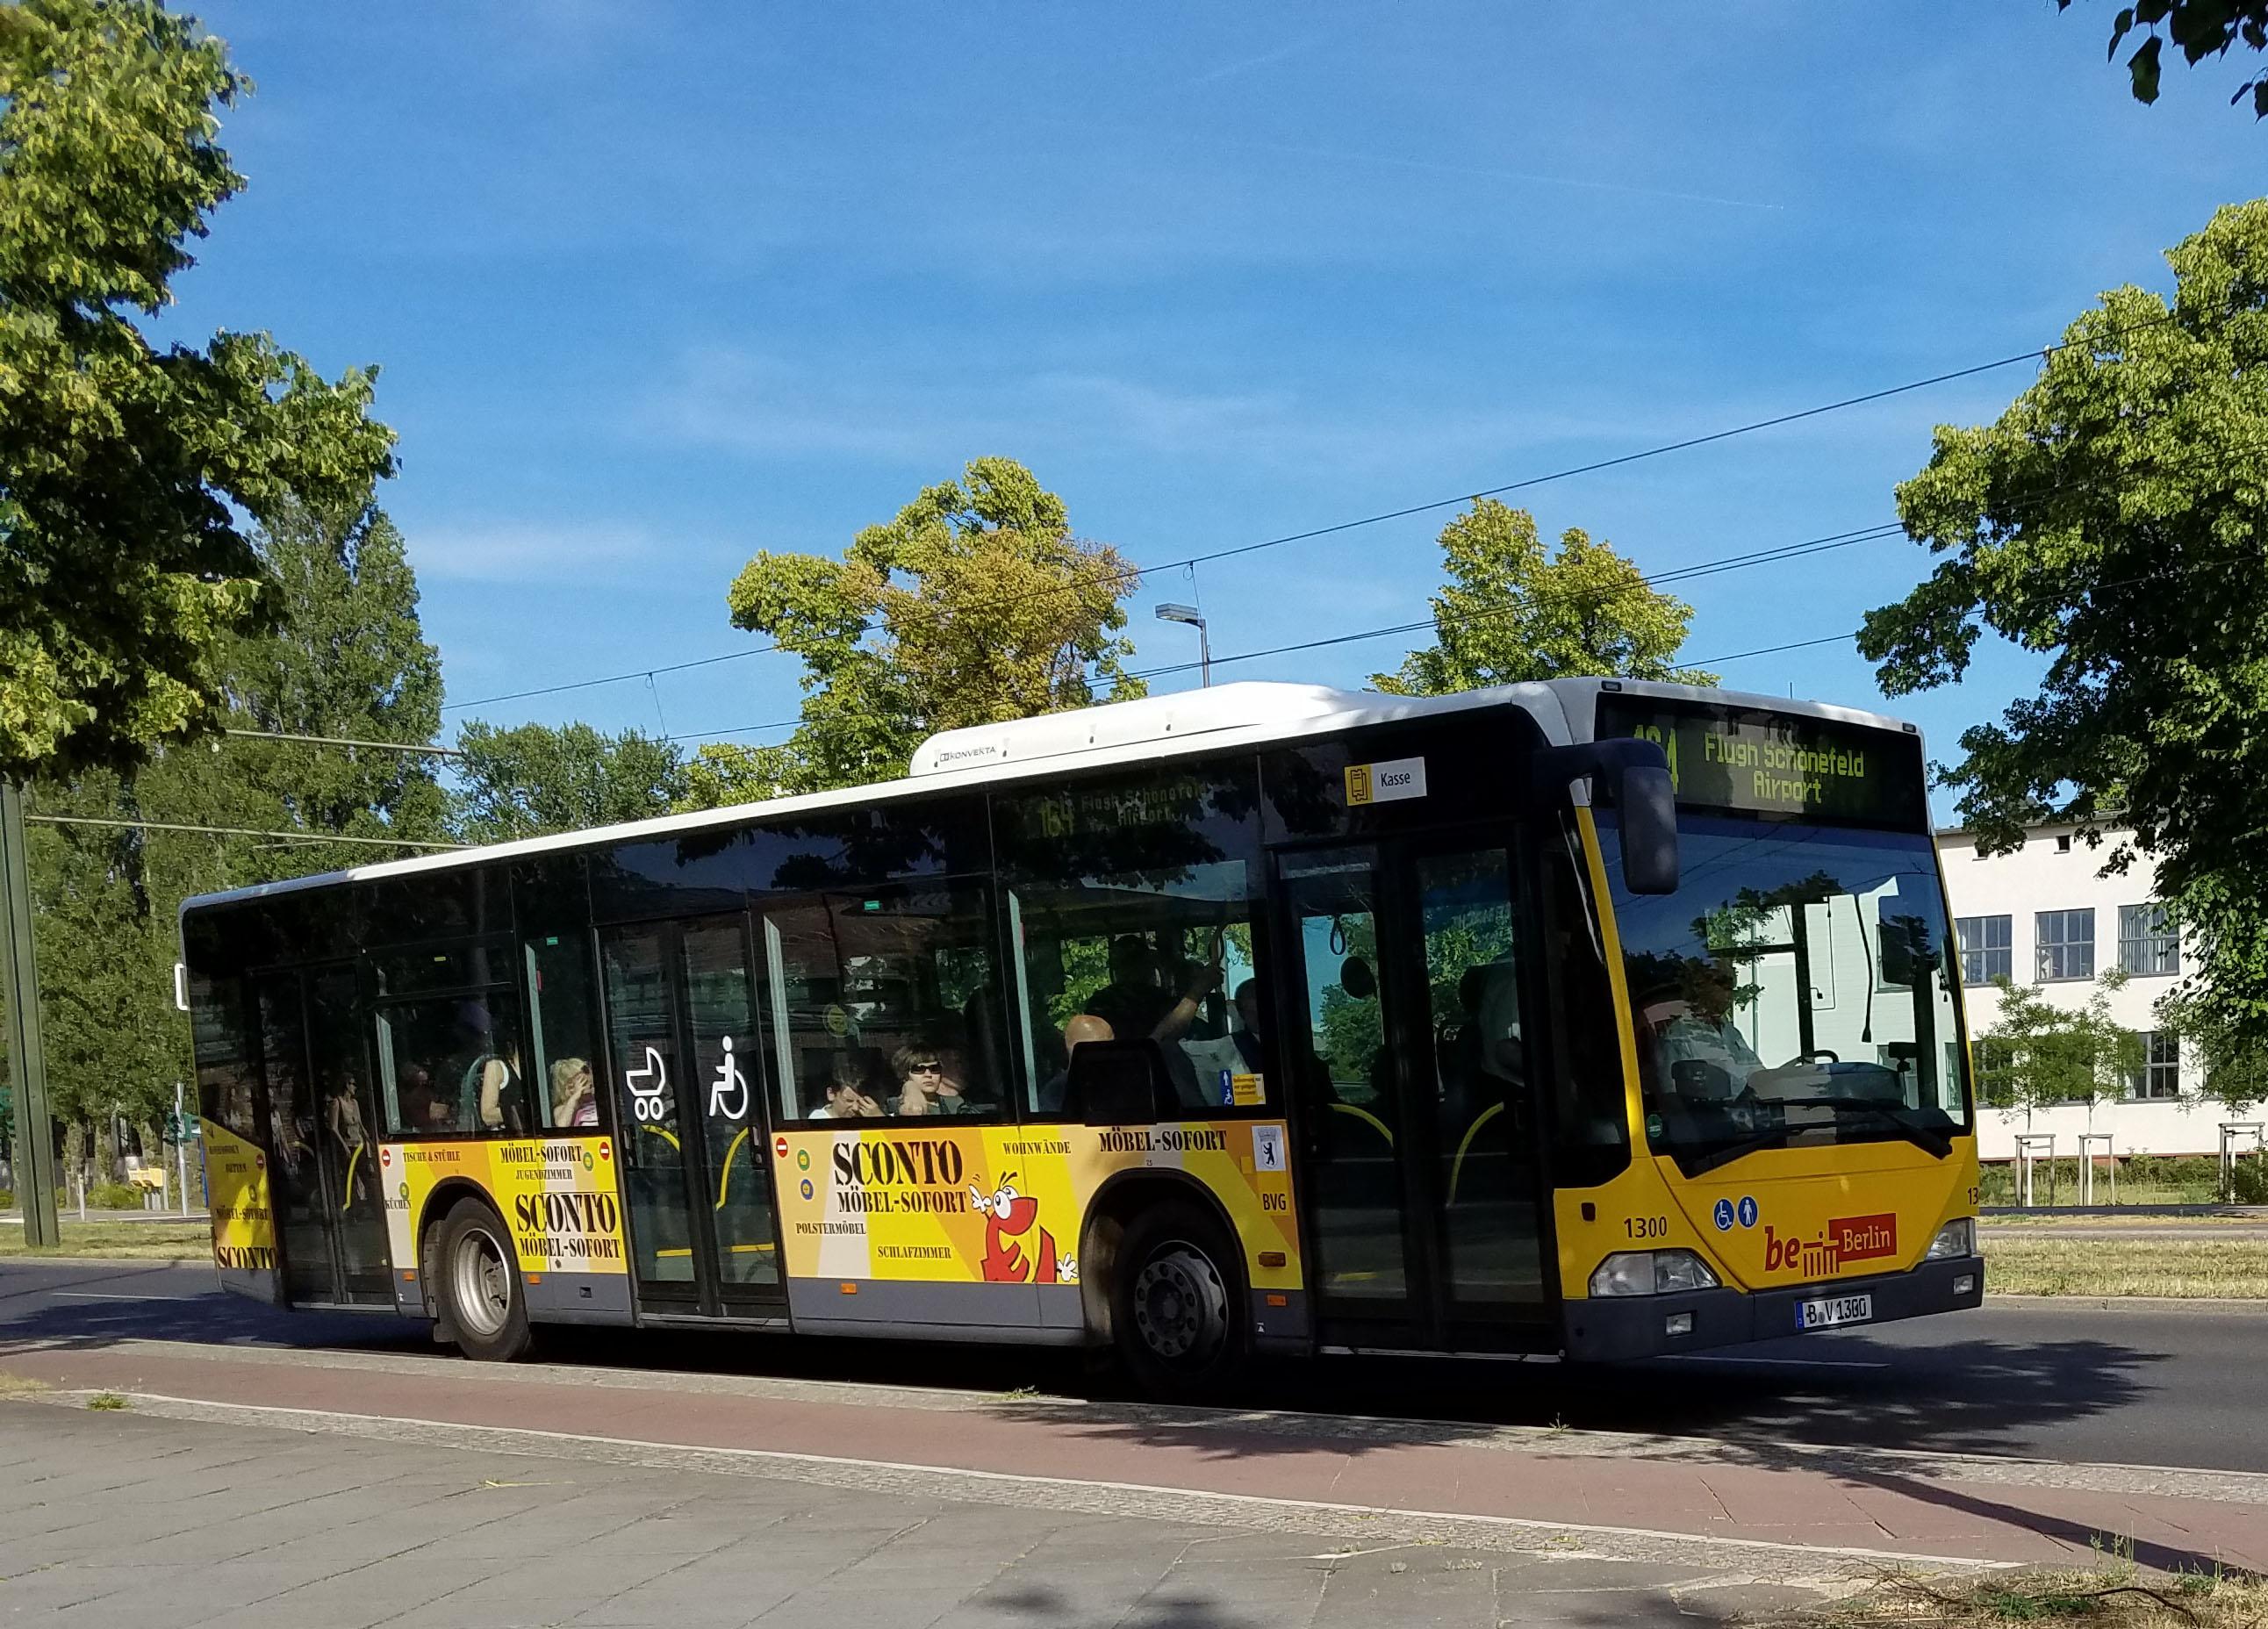 Foto: Bus 1300, Typ Citaro O530, Adlershof, Juni 2017